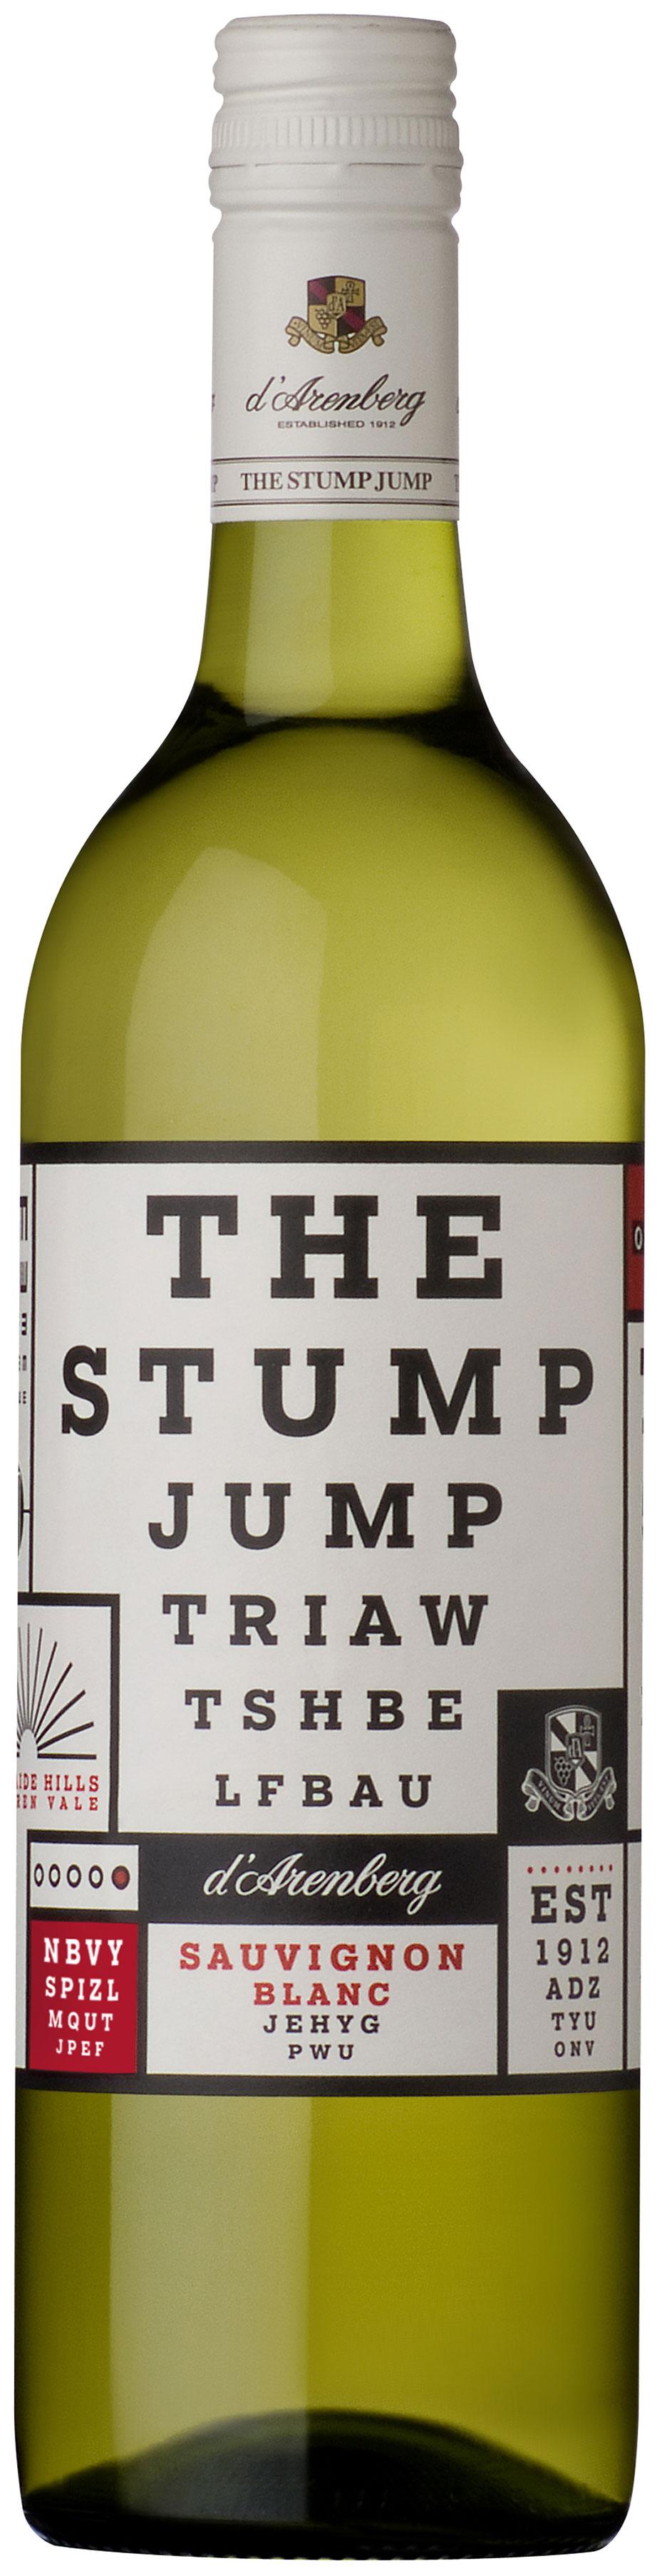 https://vinocorpperu.com/images/vinos/darenberg/the_stump_jump_sauvignon_blanc_2019.jpg